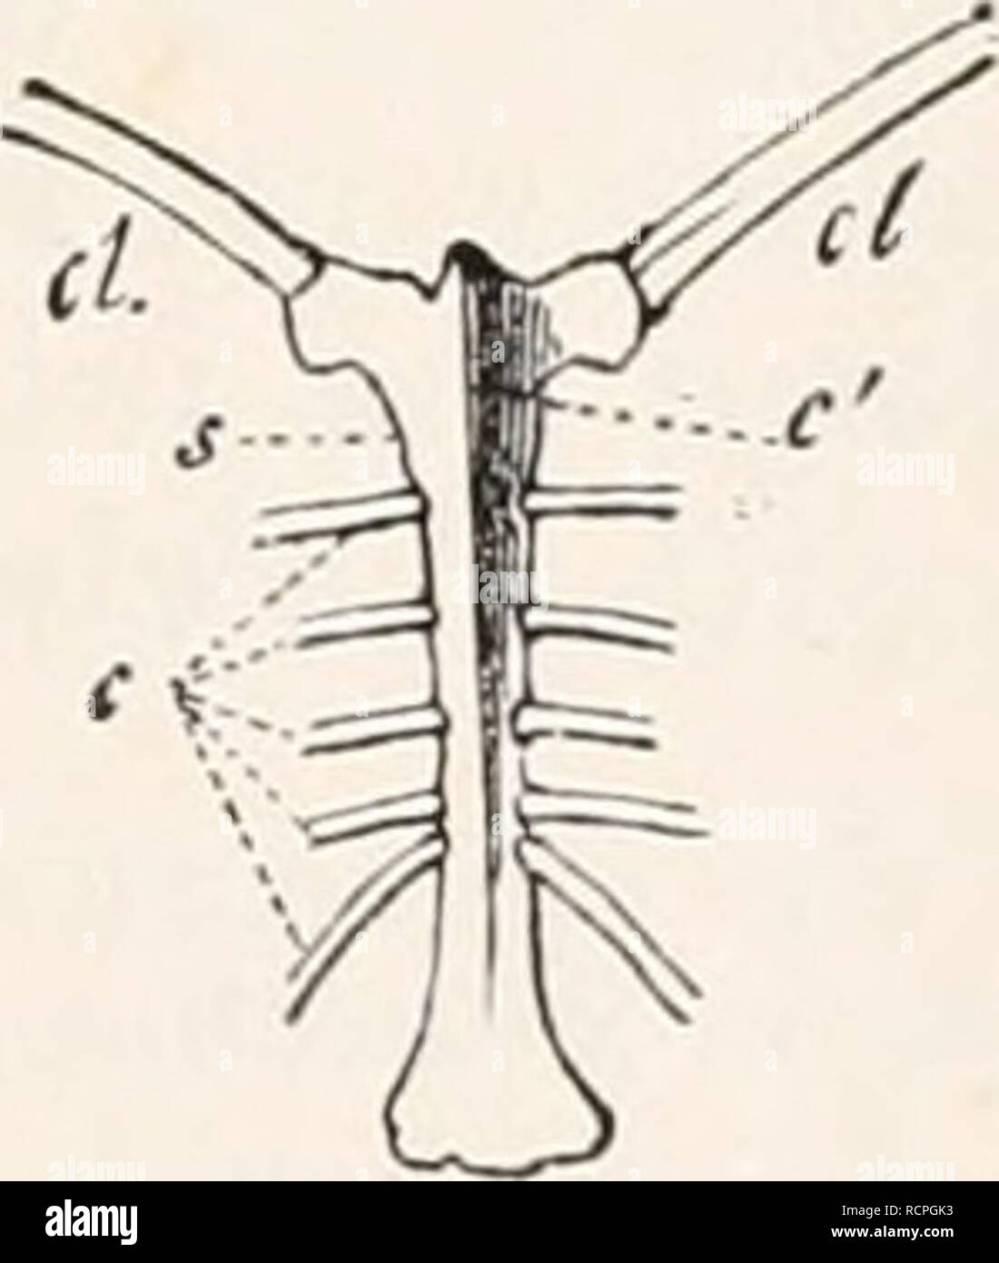 medium resolution of sternum of buteo vulgaris seen a little from one side crs crista sterni furcula c coracoid fig 235 sternum of numida nielea